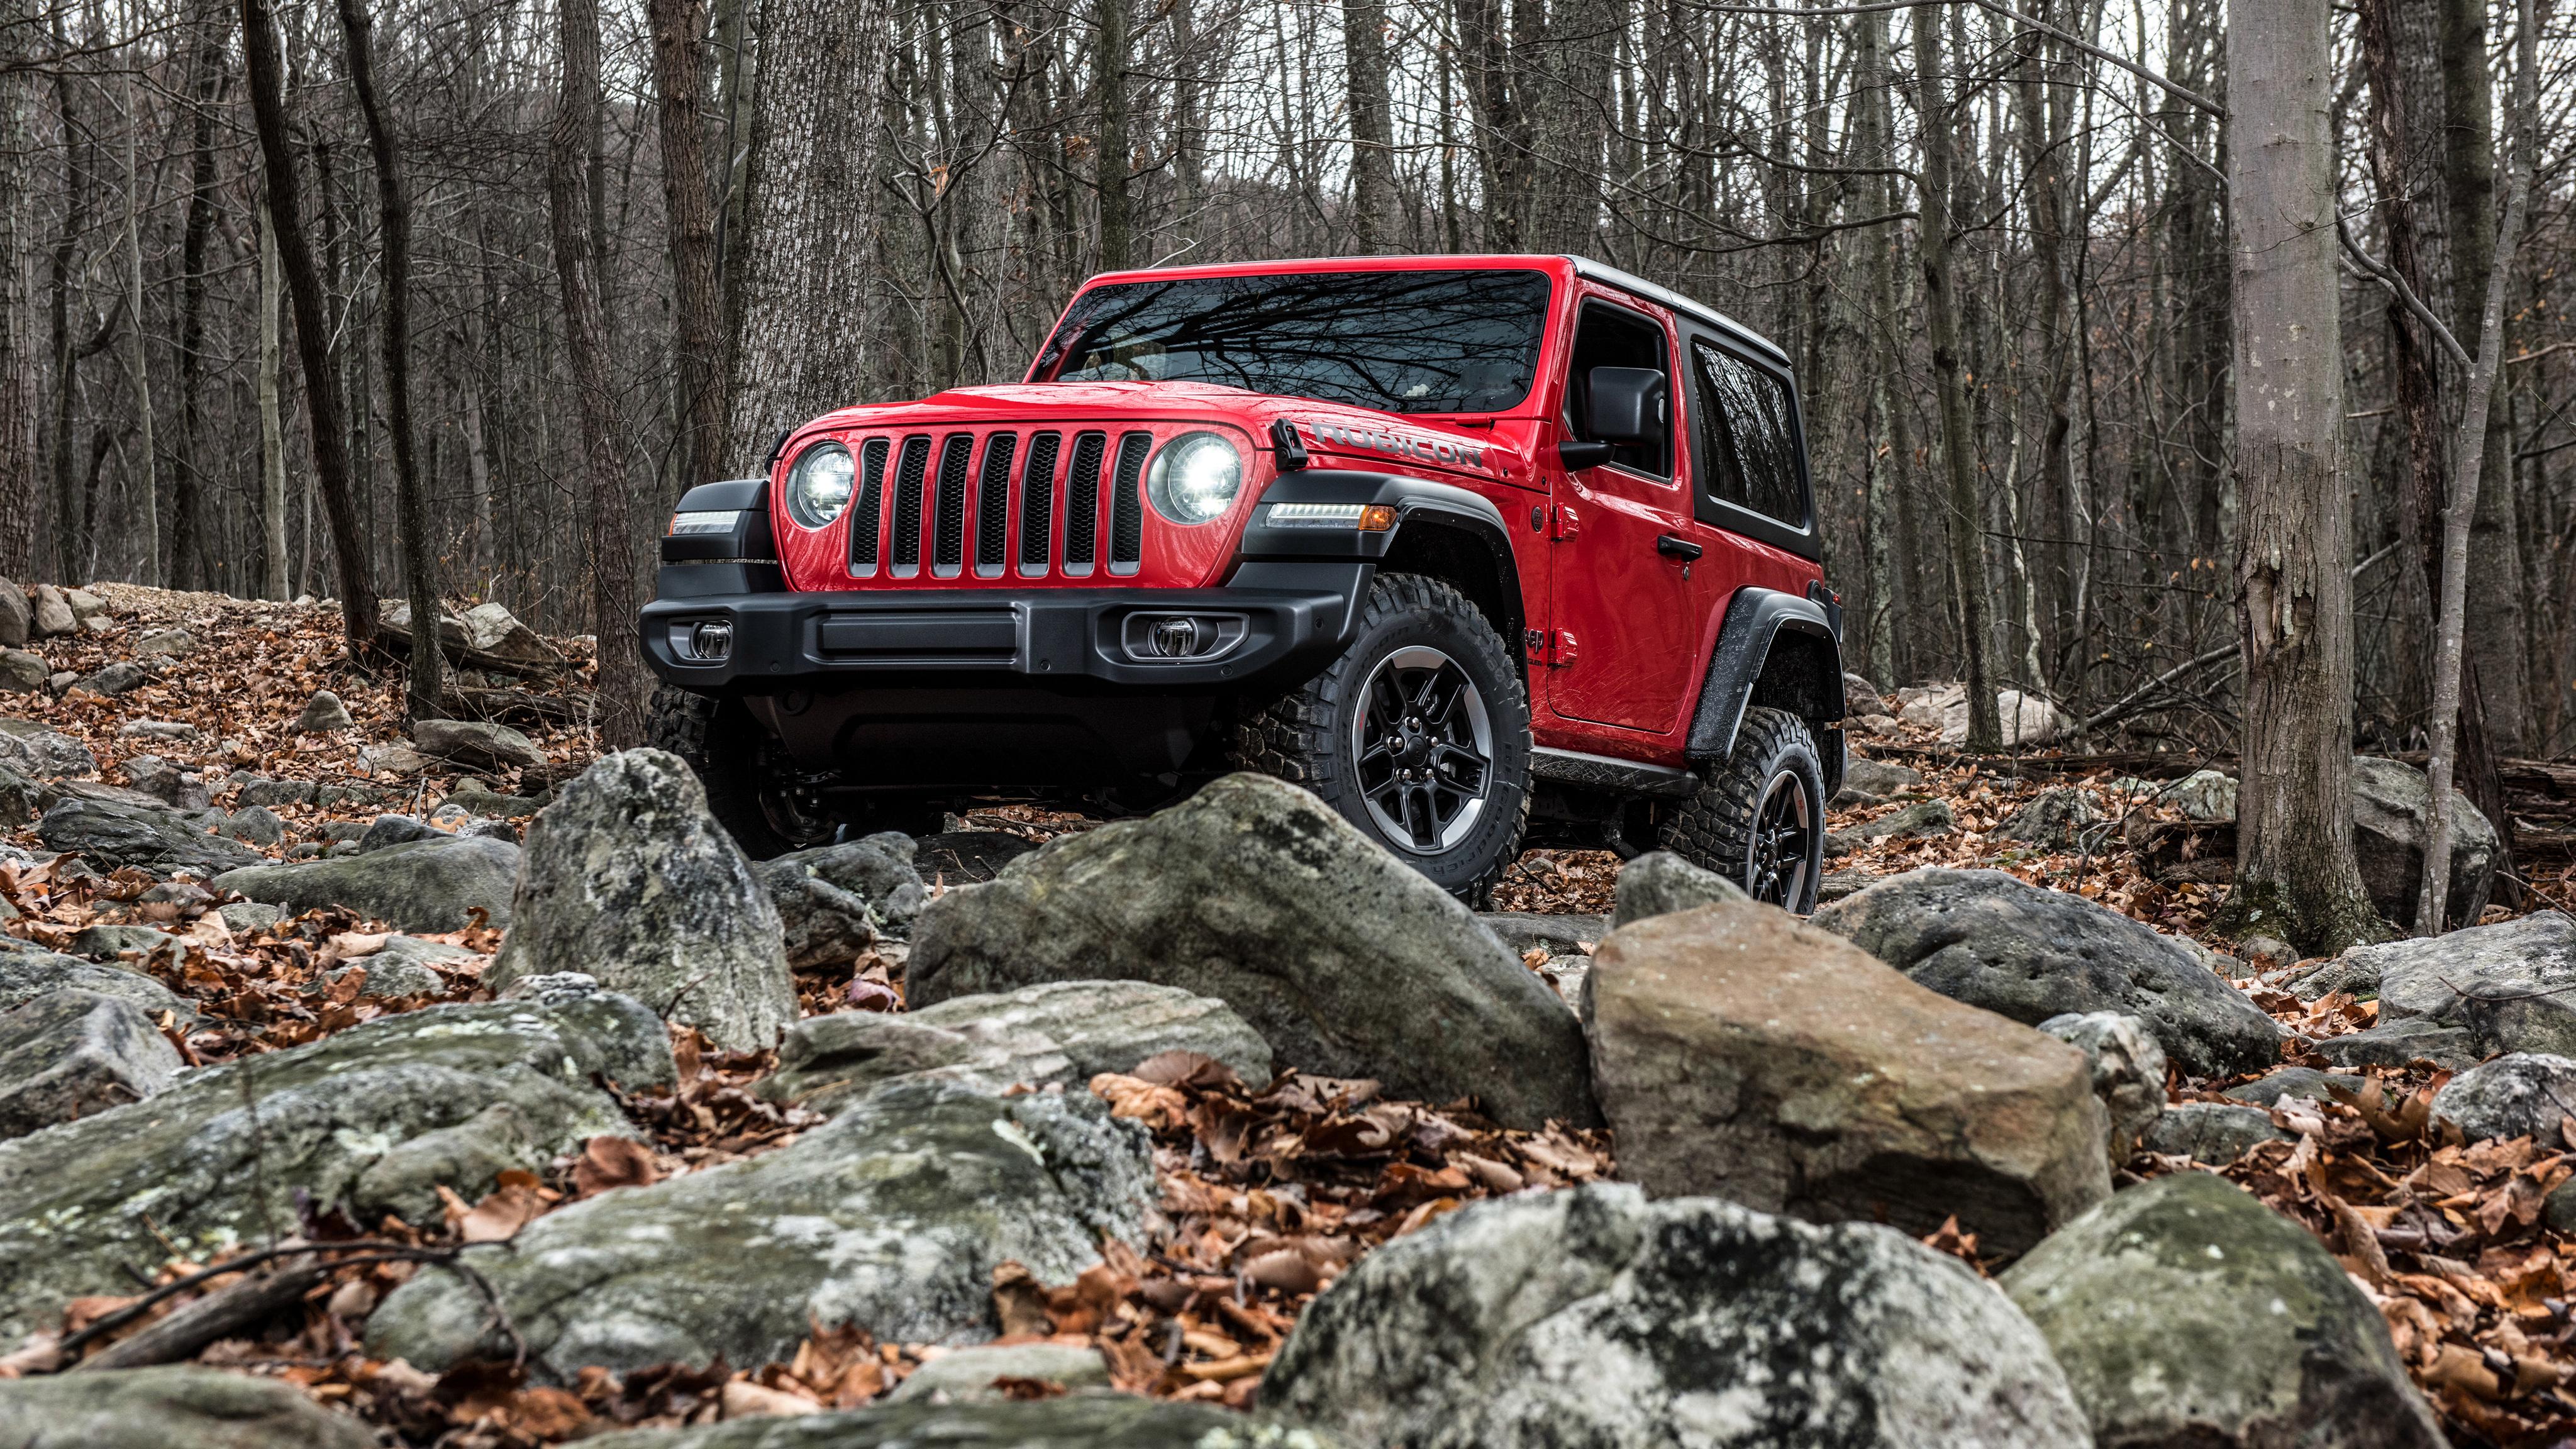 Jeep Renegade Trailhawk For Sale >> 2018 Jeep Wrangler Rubicon 4K Wallpaper | HD Car ...